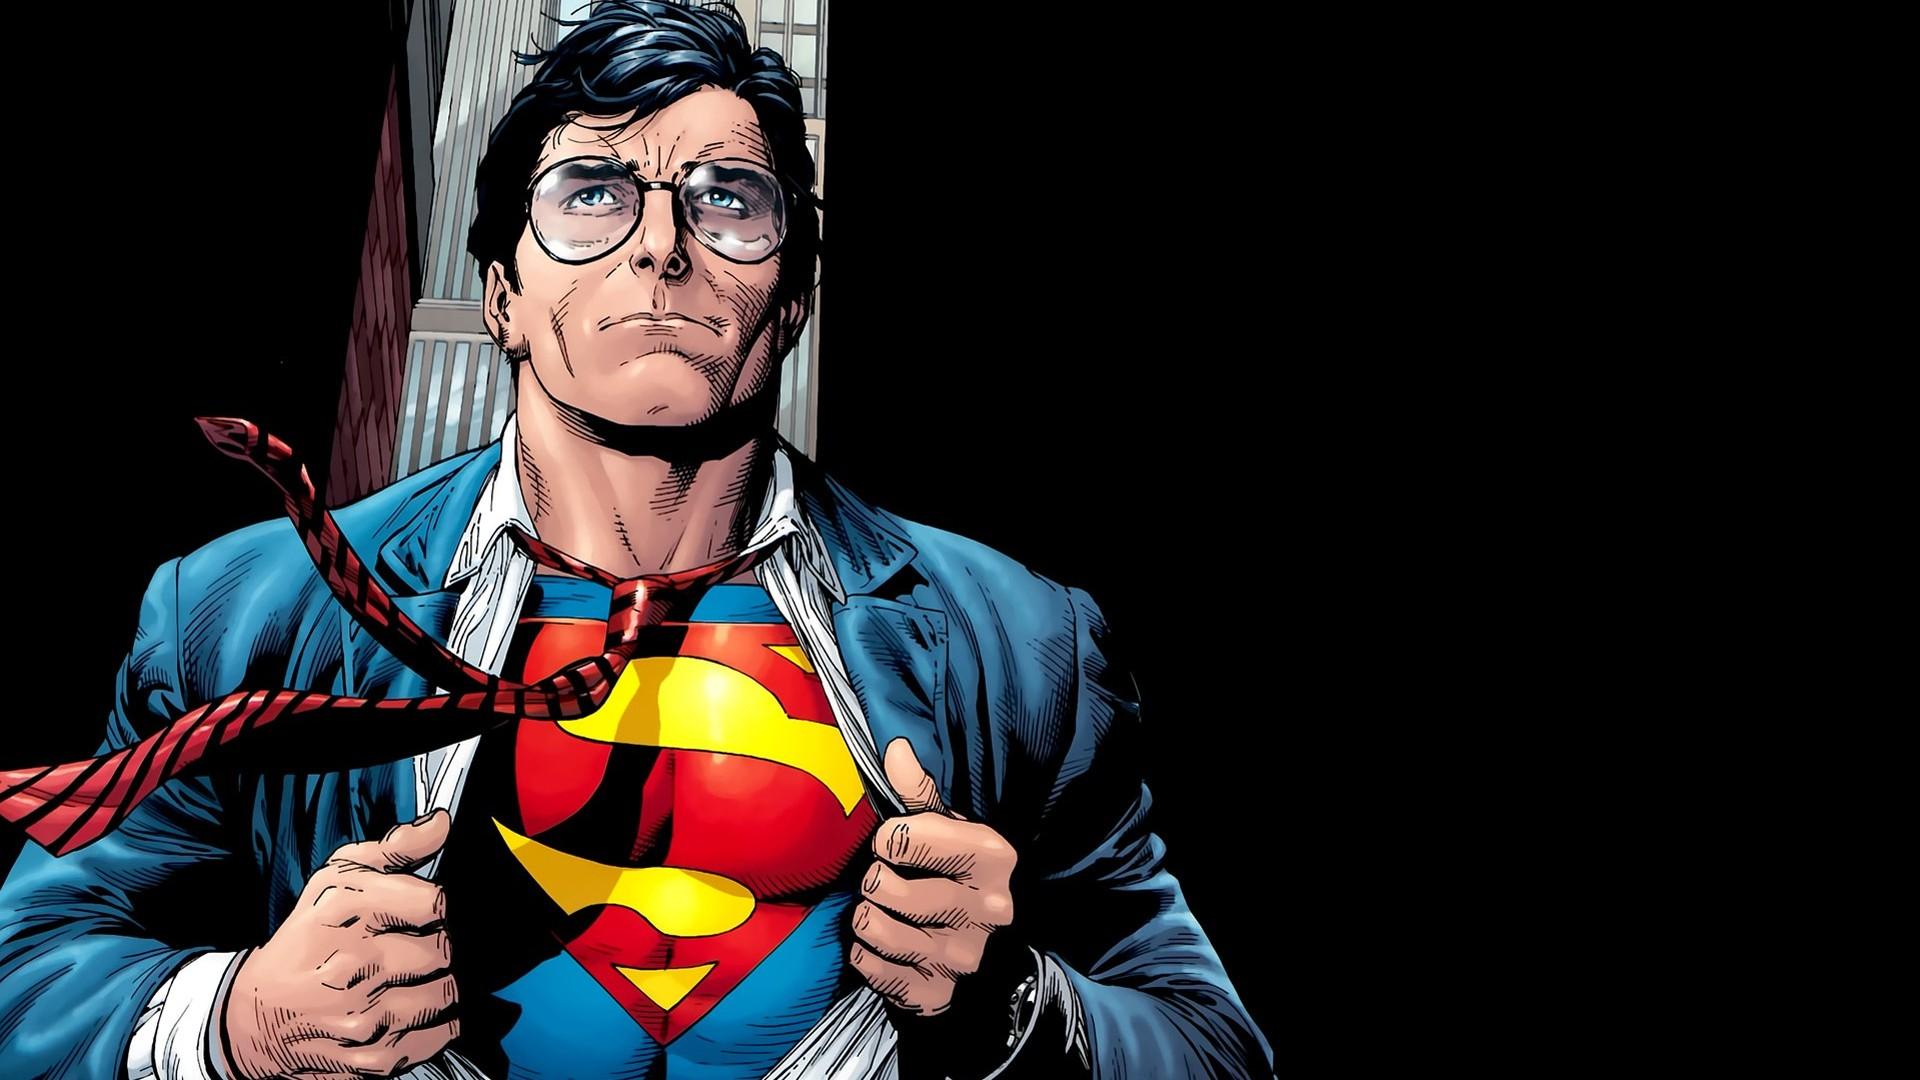 superman-comic-hd-wallpaper-1920x1080-31090.jpg